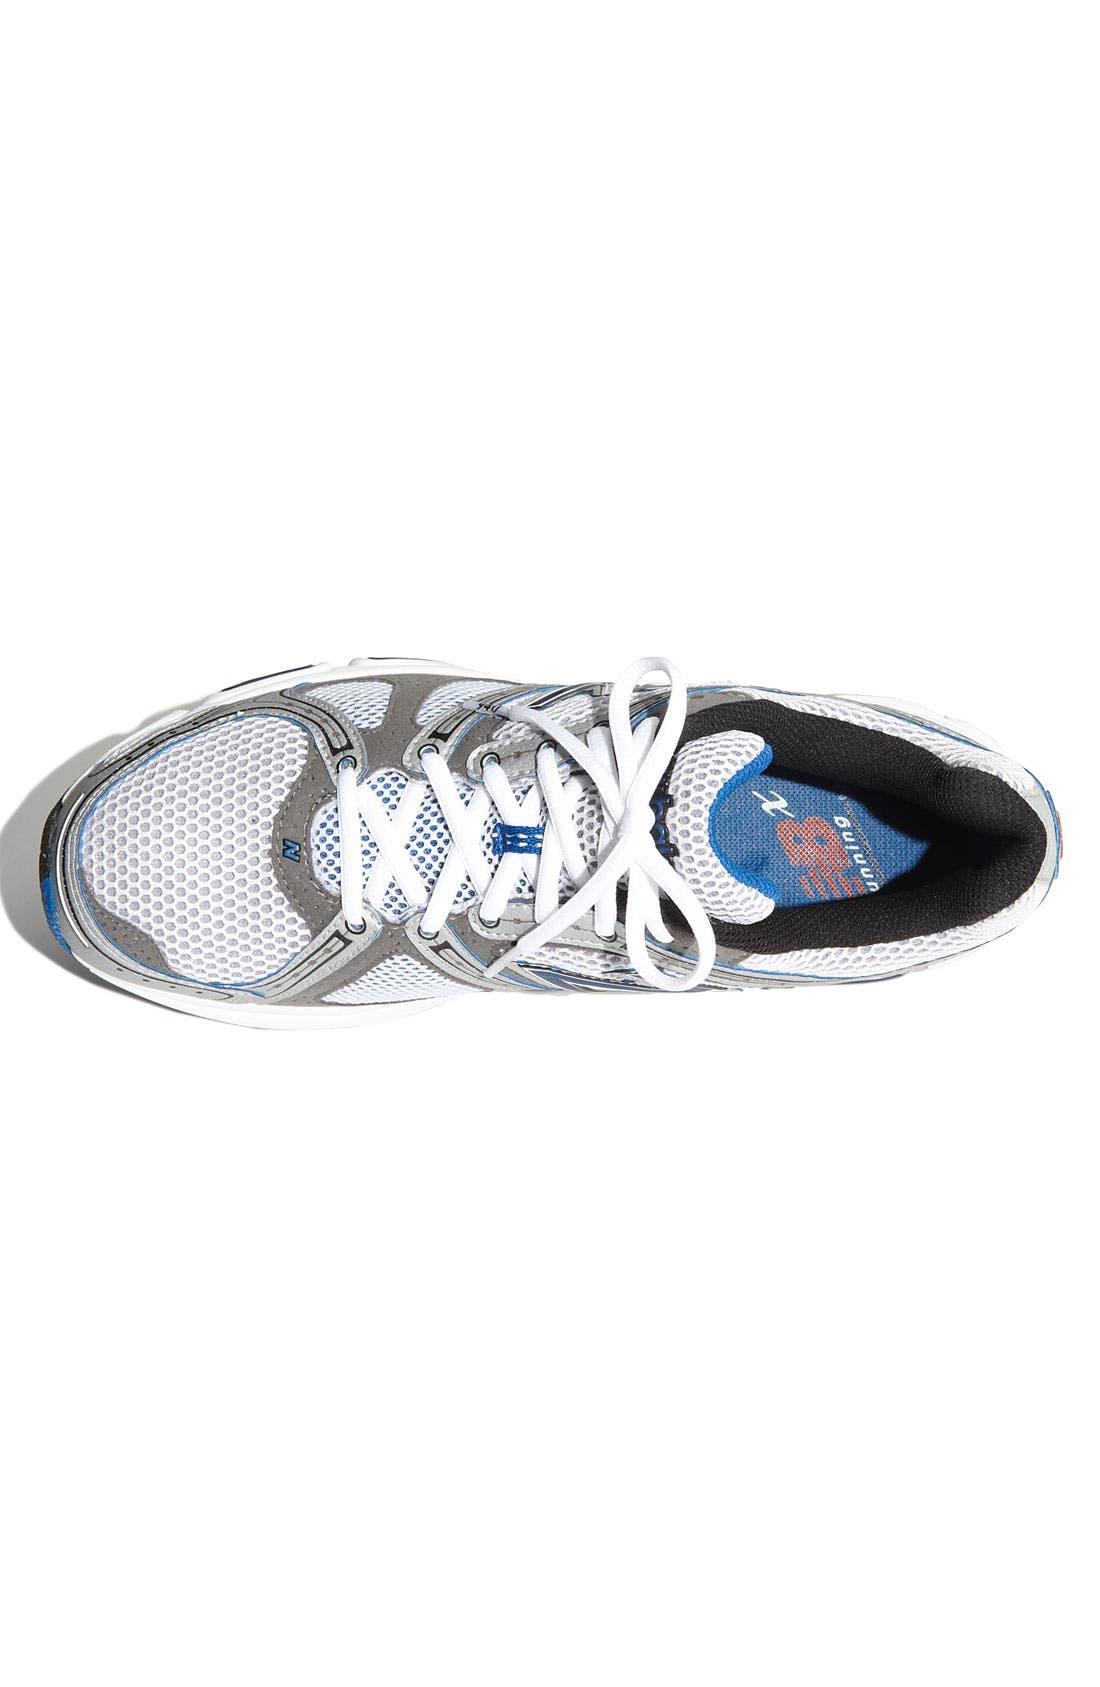 Alternate Image 2  - New Balance '940' Running Shoe (Men) (Online Only)